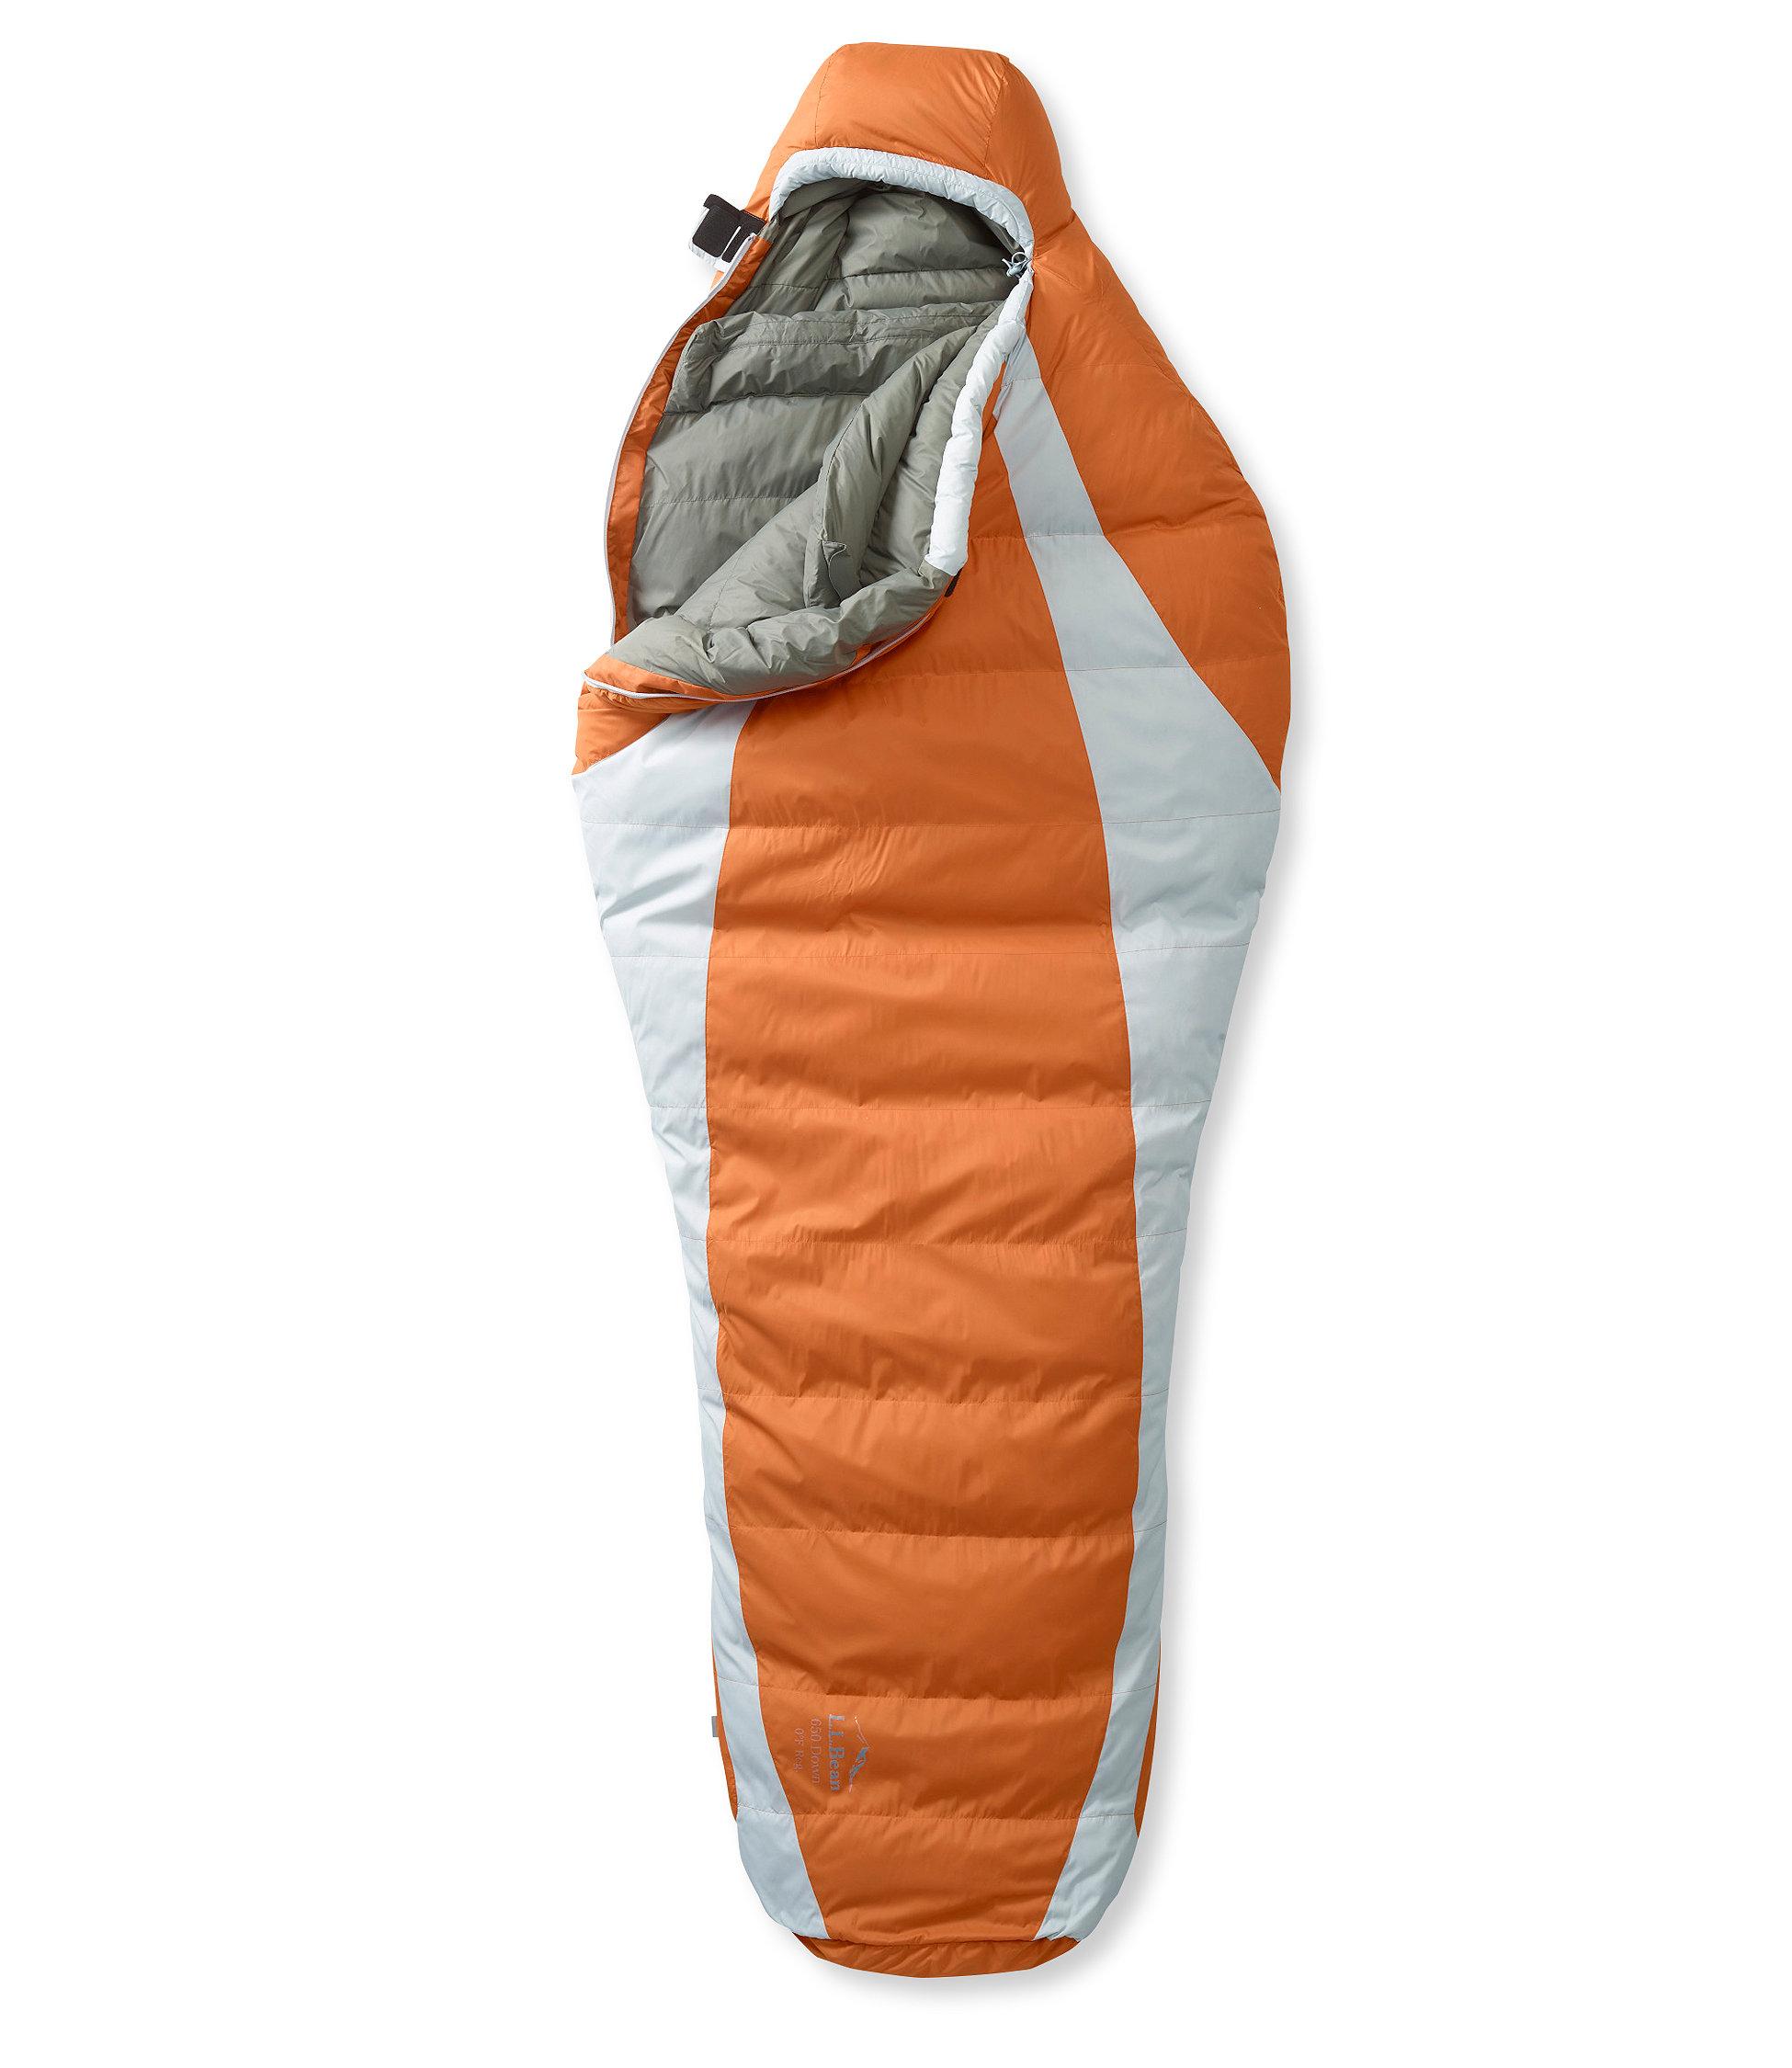 photo: L.L.Bean Down Sleeping Bag with DownTek, Mummy 0° 3-season down sleeping bag